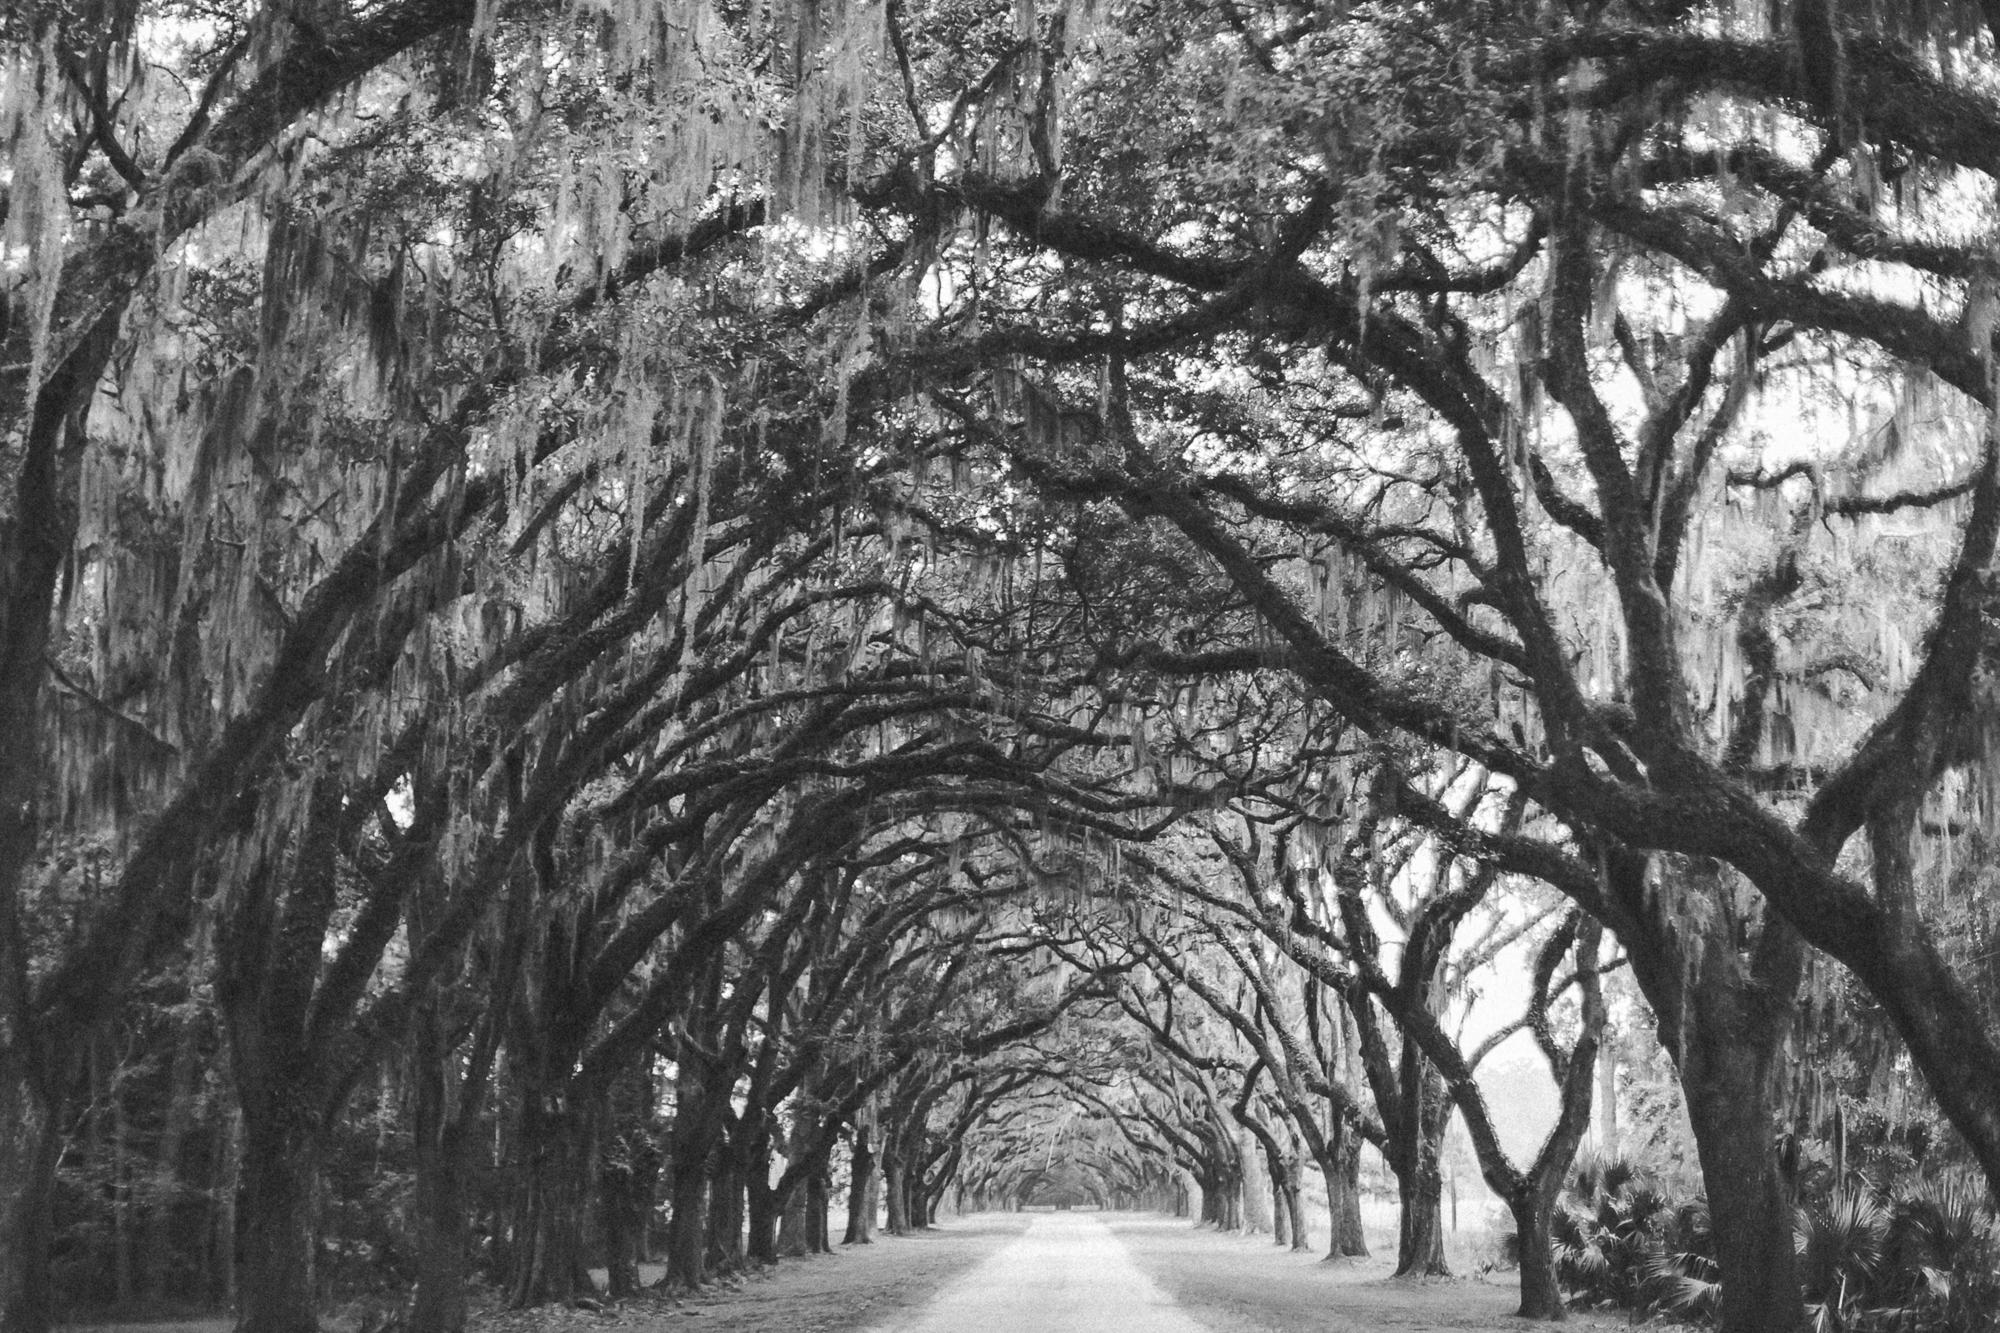 Savannah Georgia - Wormsloe - DiBlasio Photo-0106.jpg